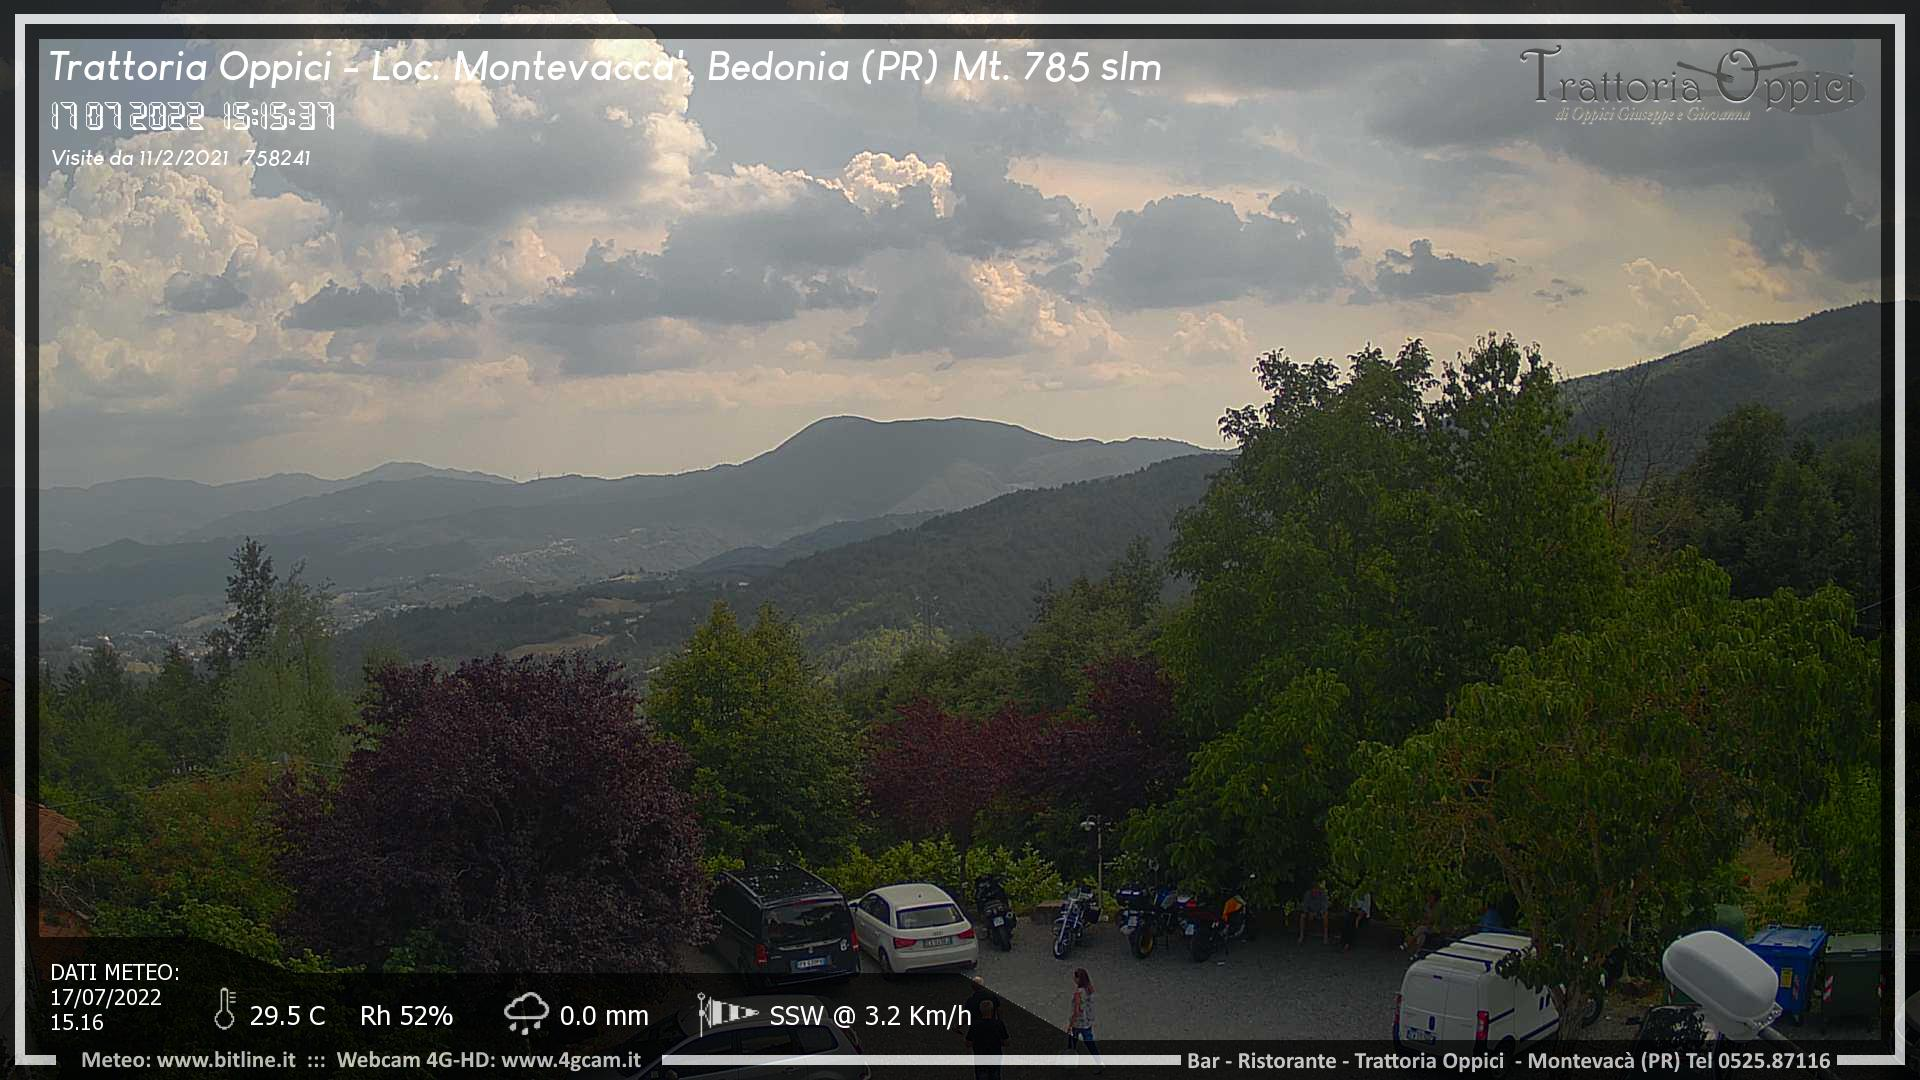 Montevacà - Trattoria Oppici